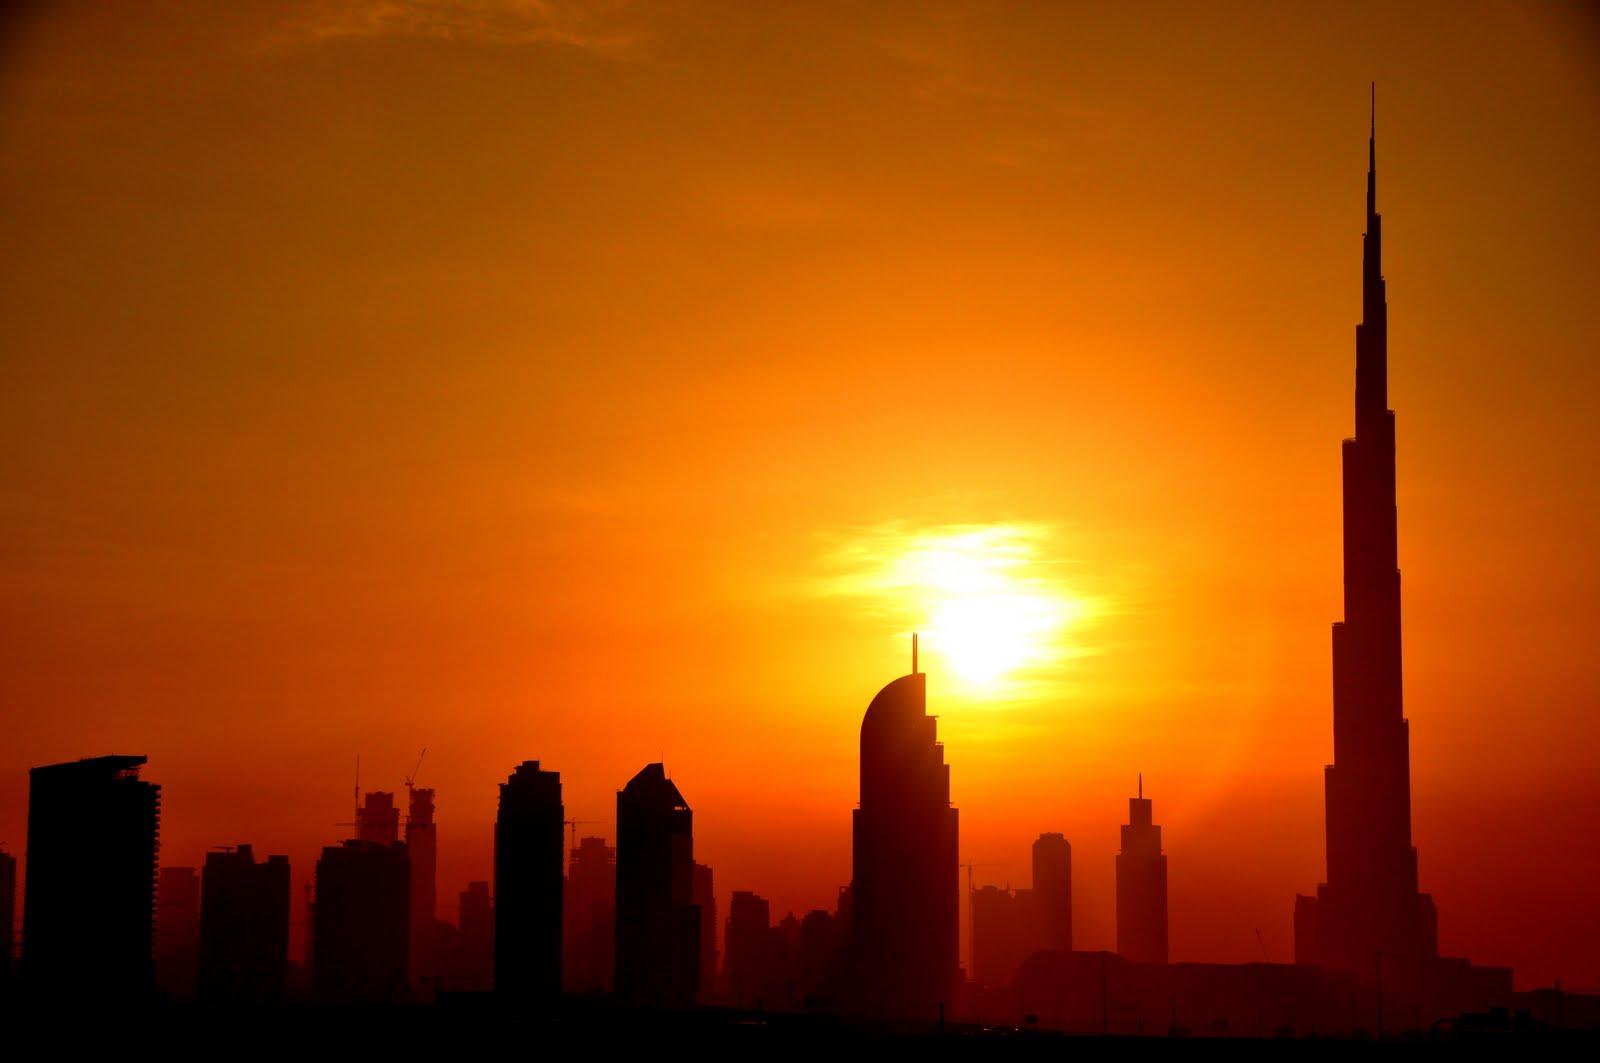 extravagantne-arabske-mesto (15)